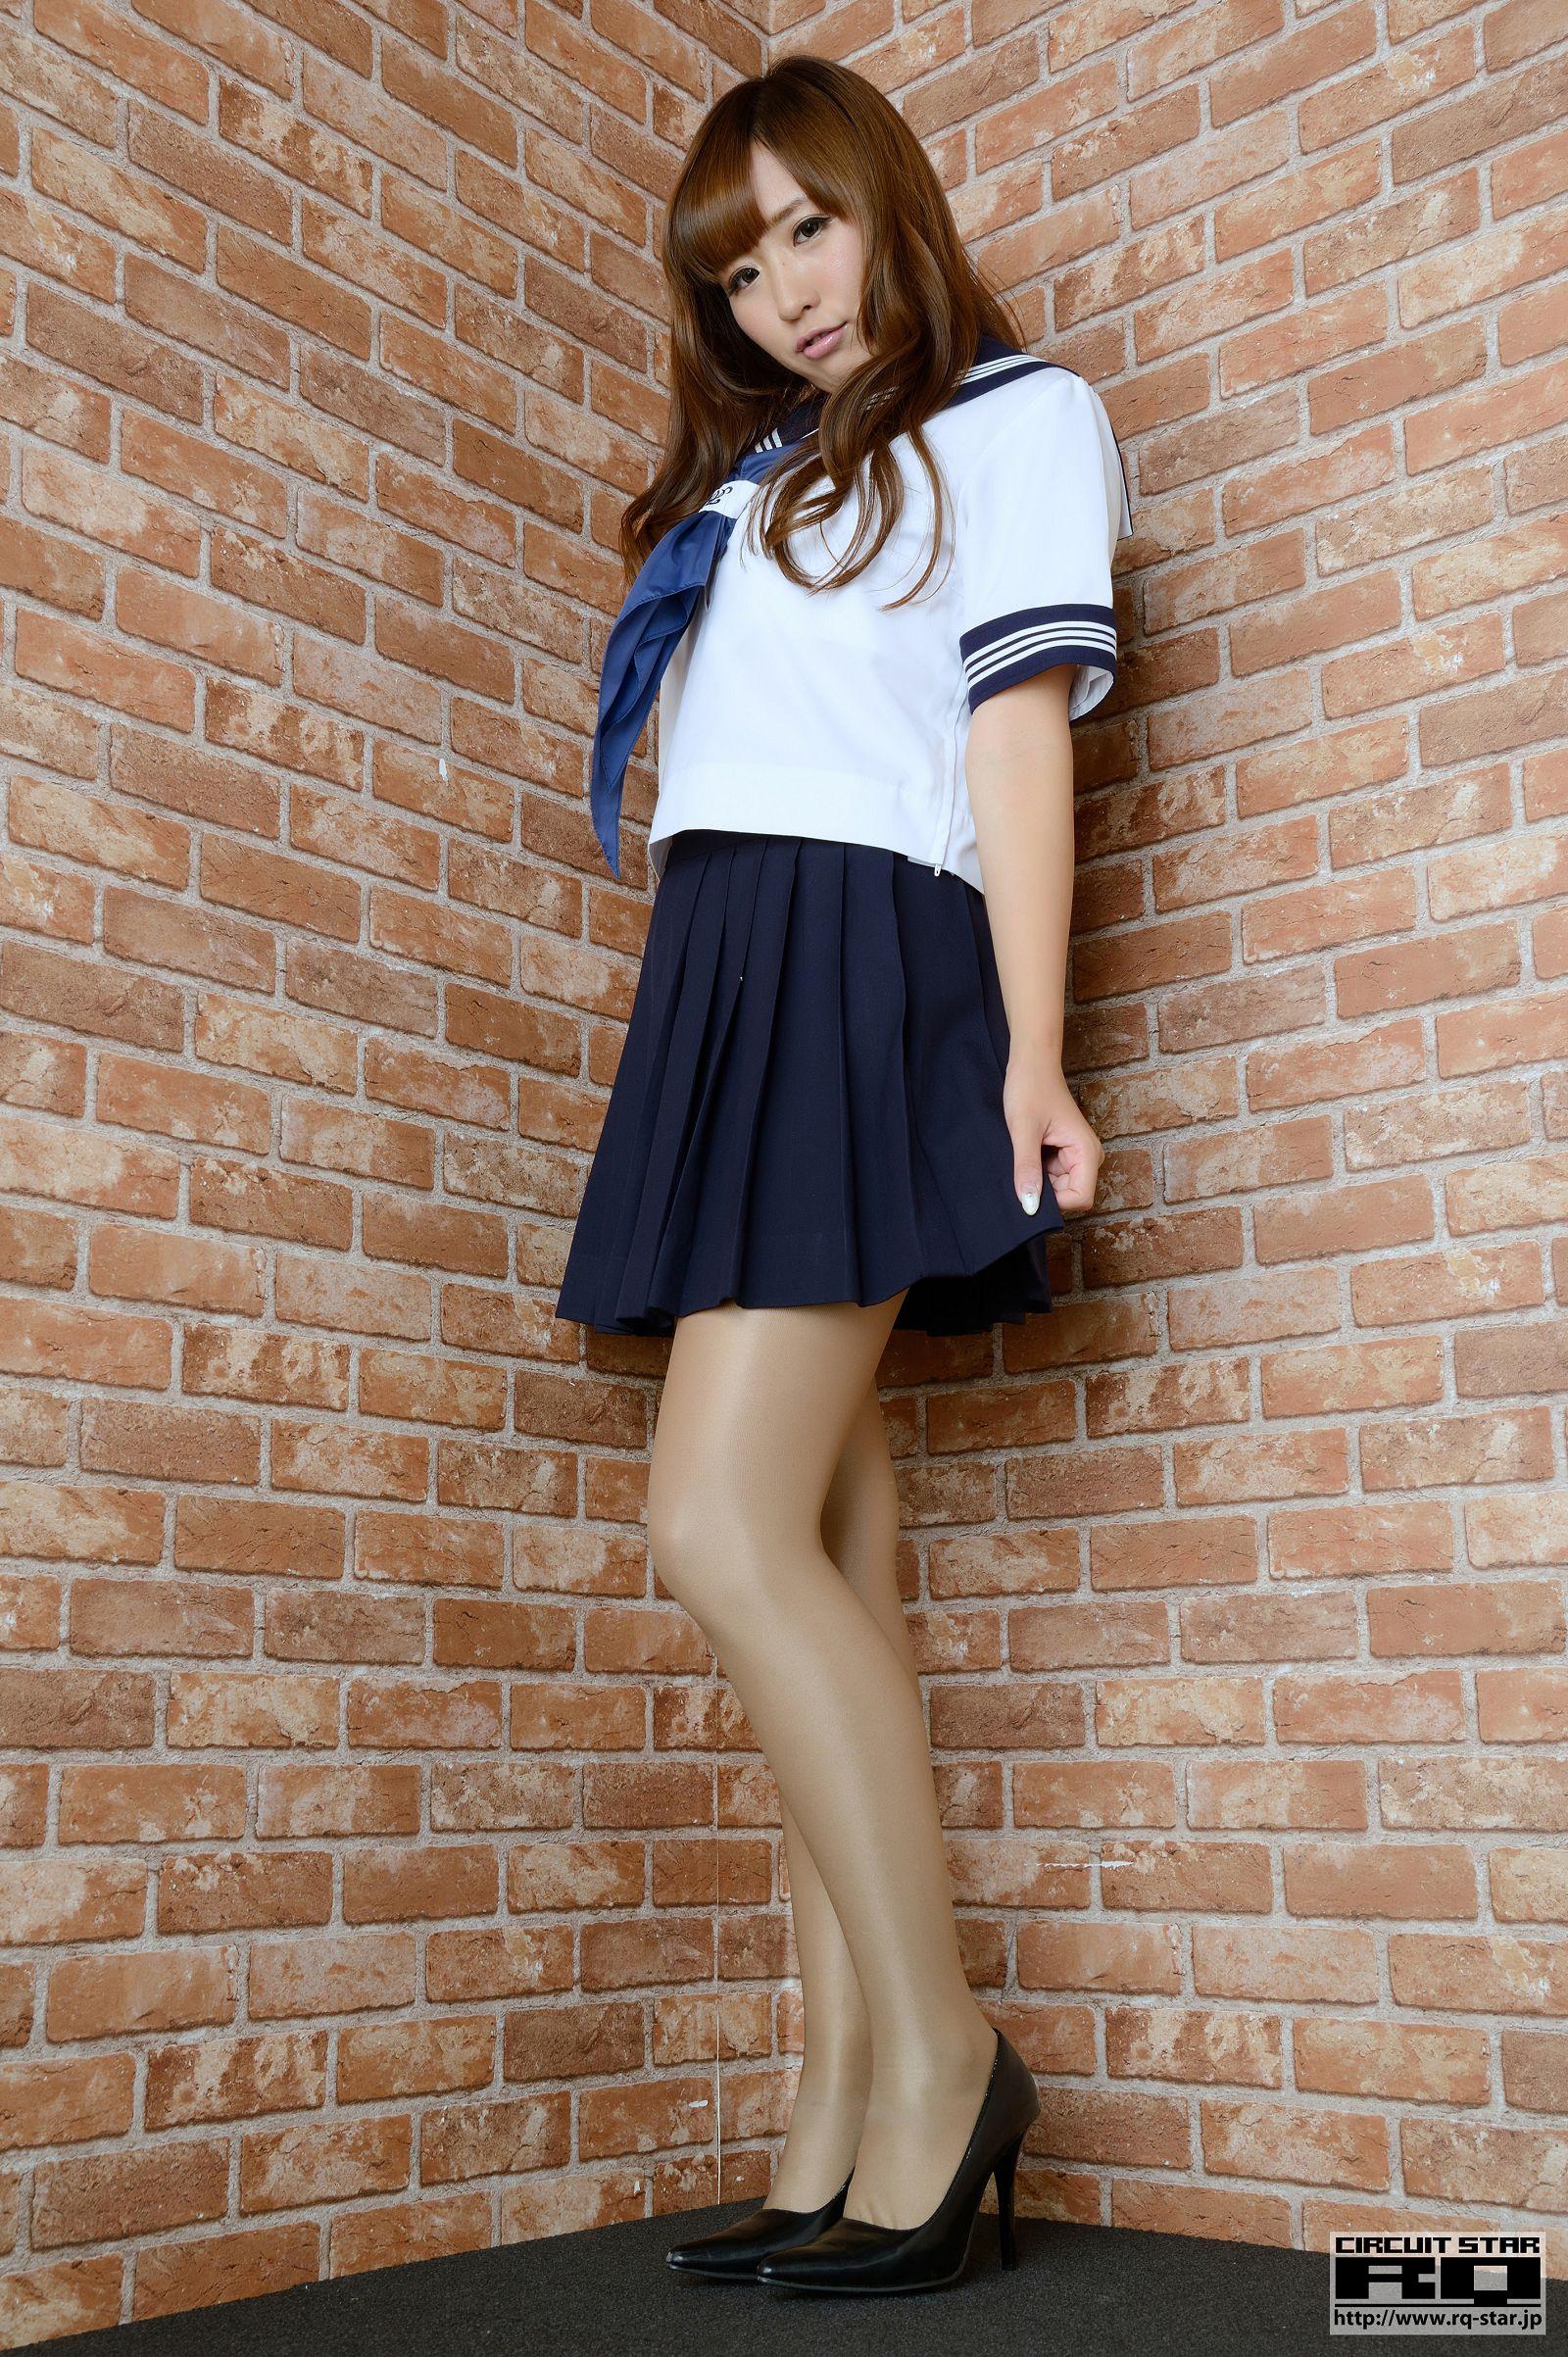 [RQ STAR美女] NO.00839 Marina Kashiwagi 柏木まりな Sailor Style[70P] RQ STAR 第1张